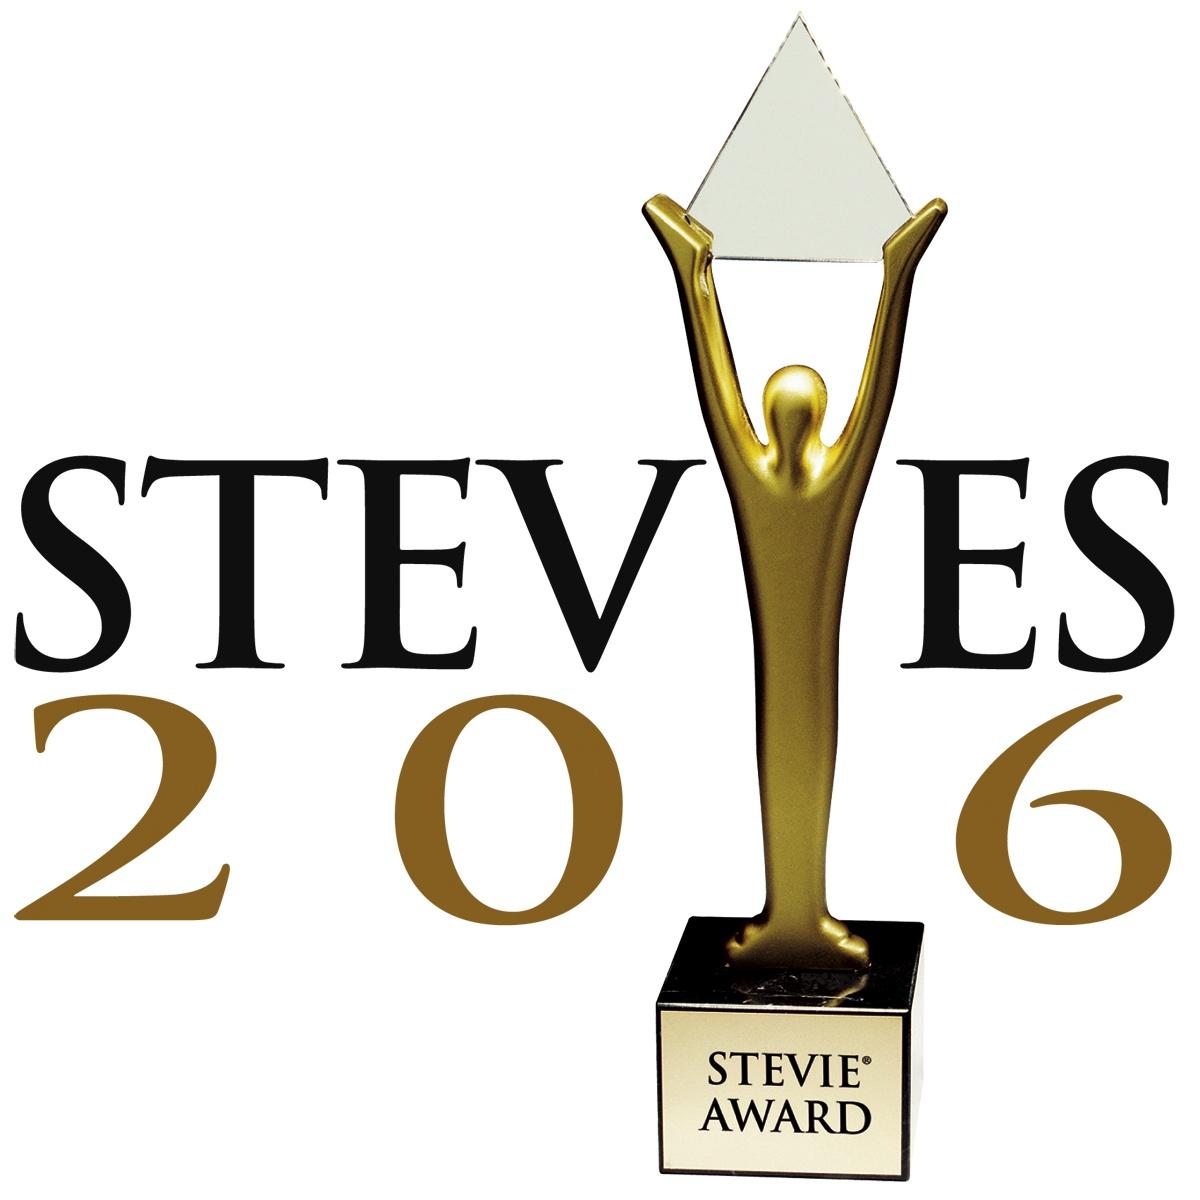 Stevie2016_Logo_L.jpg